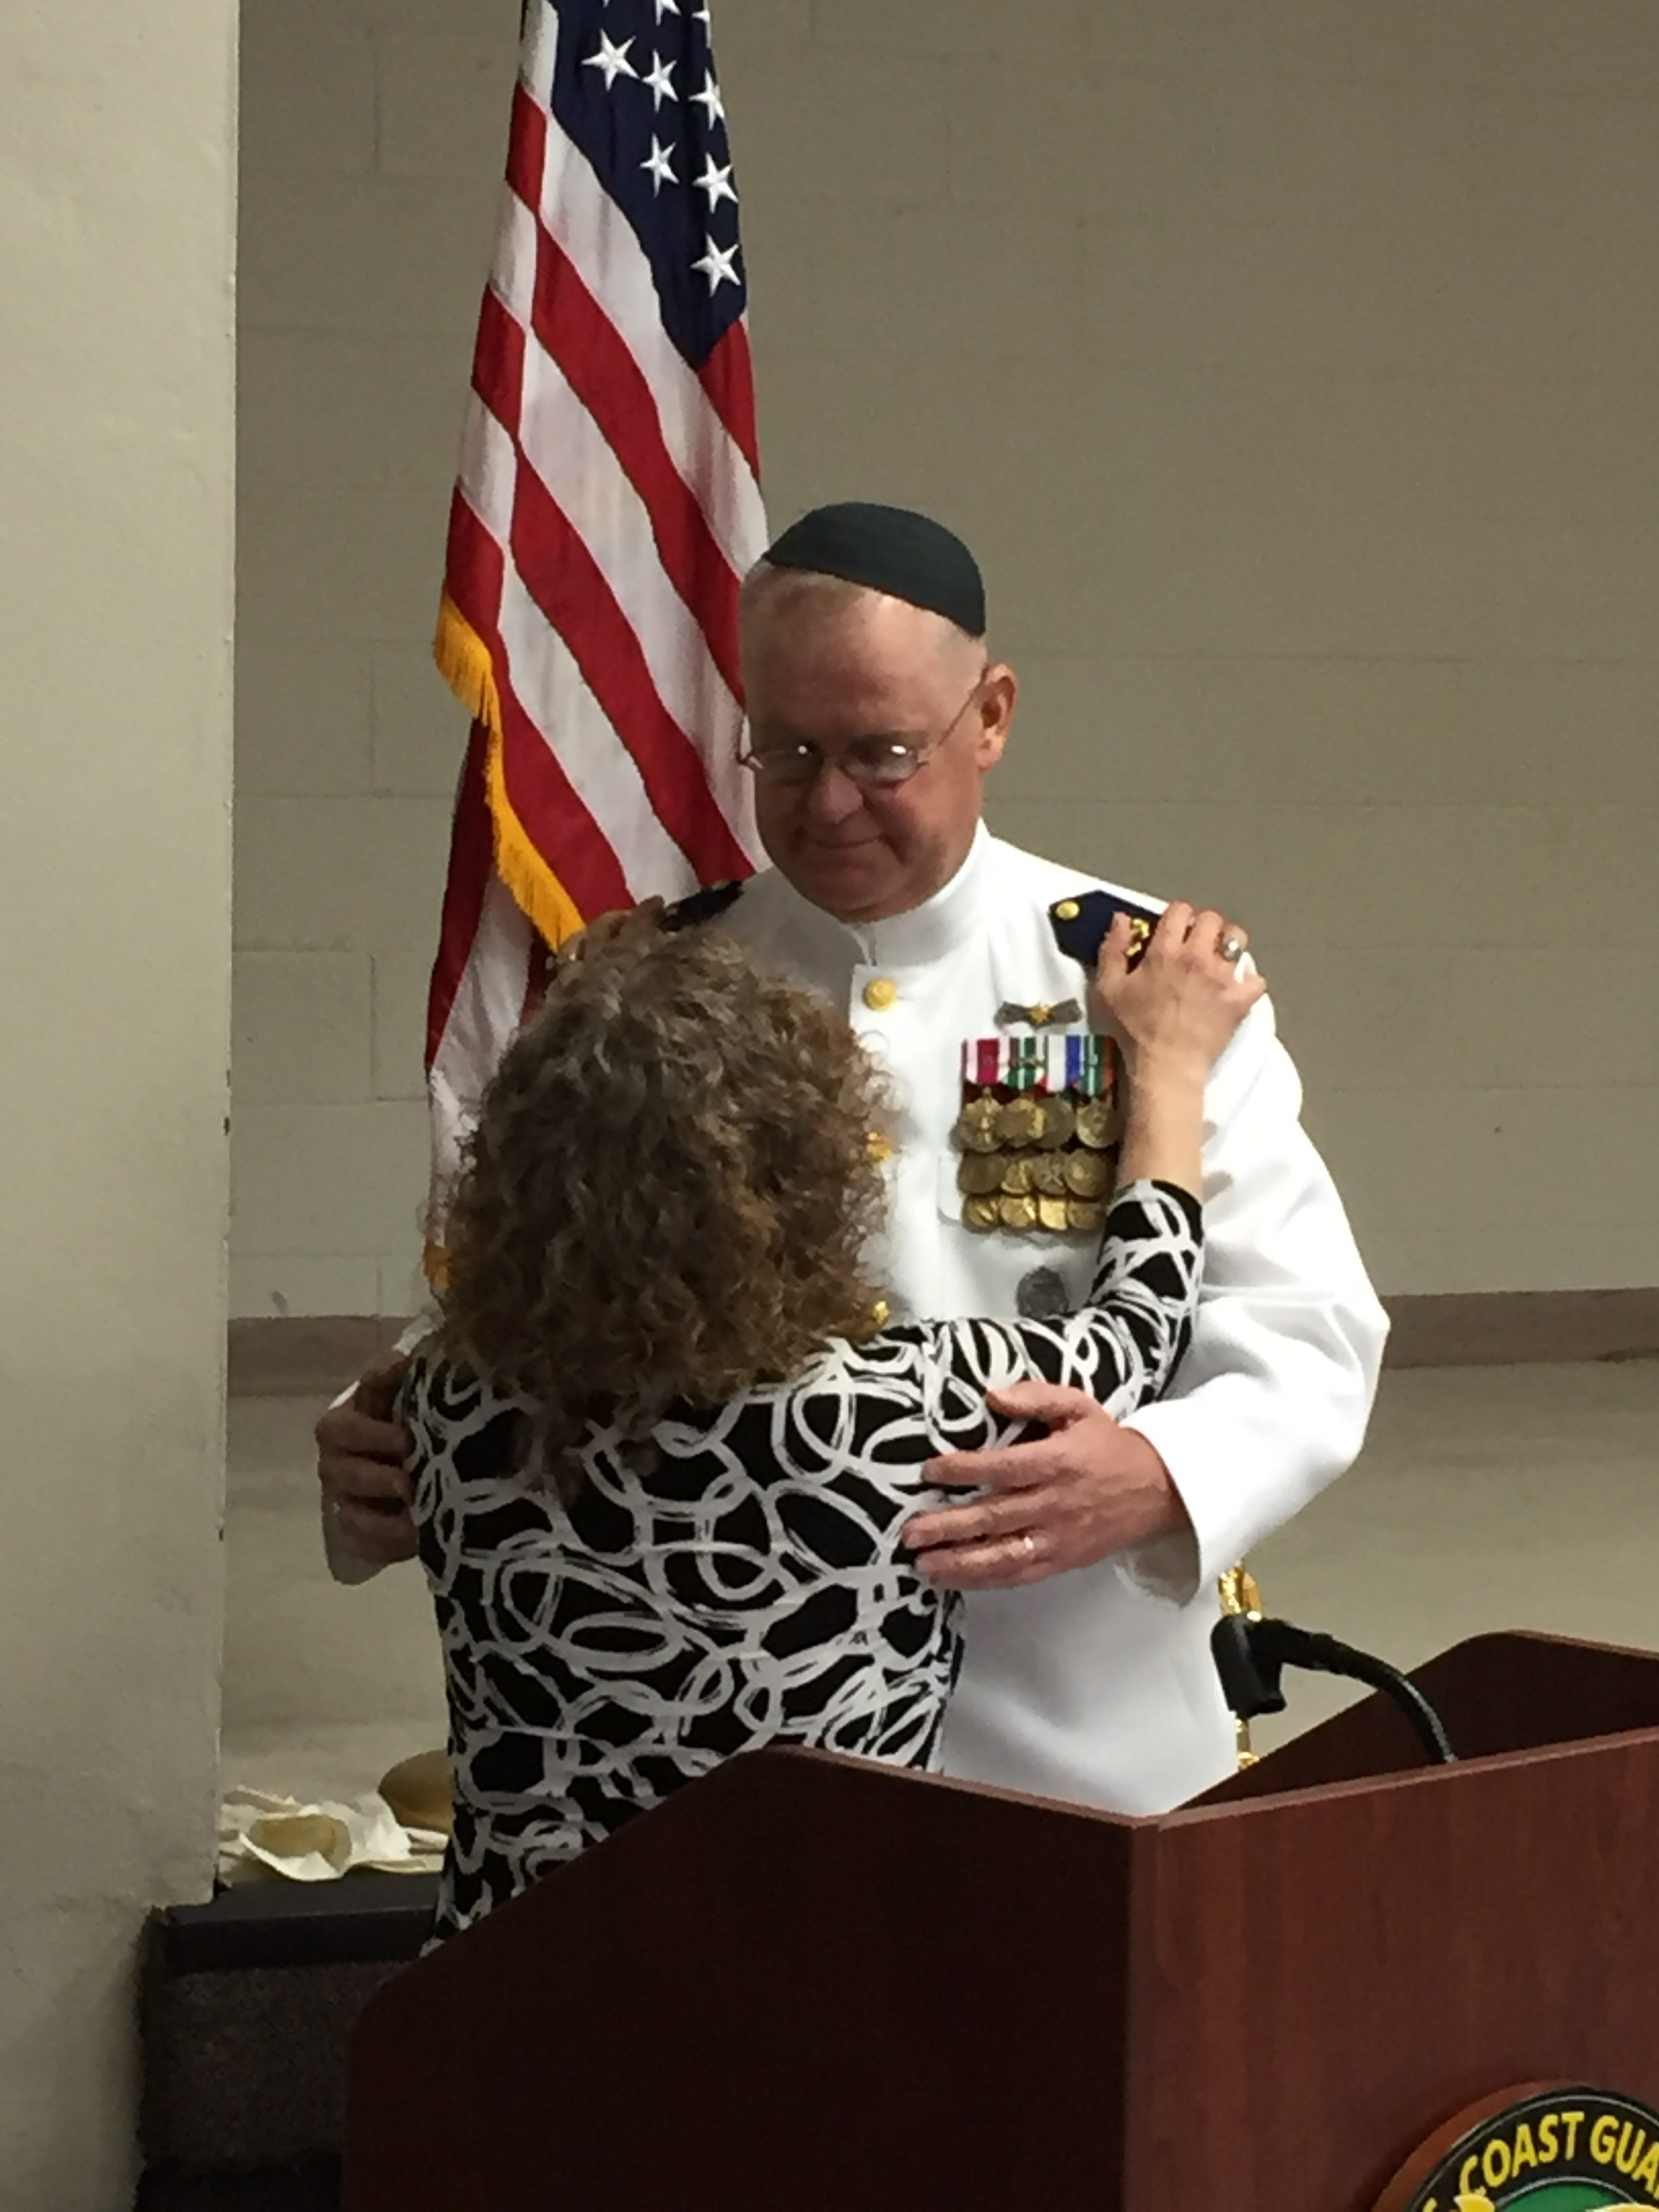 James Todd, 9-11 hero, retires from Coast Guard | Jewish Community